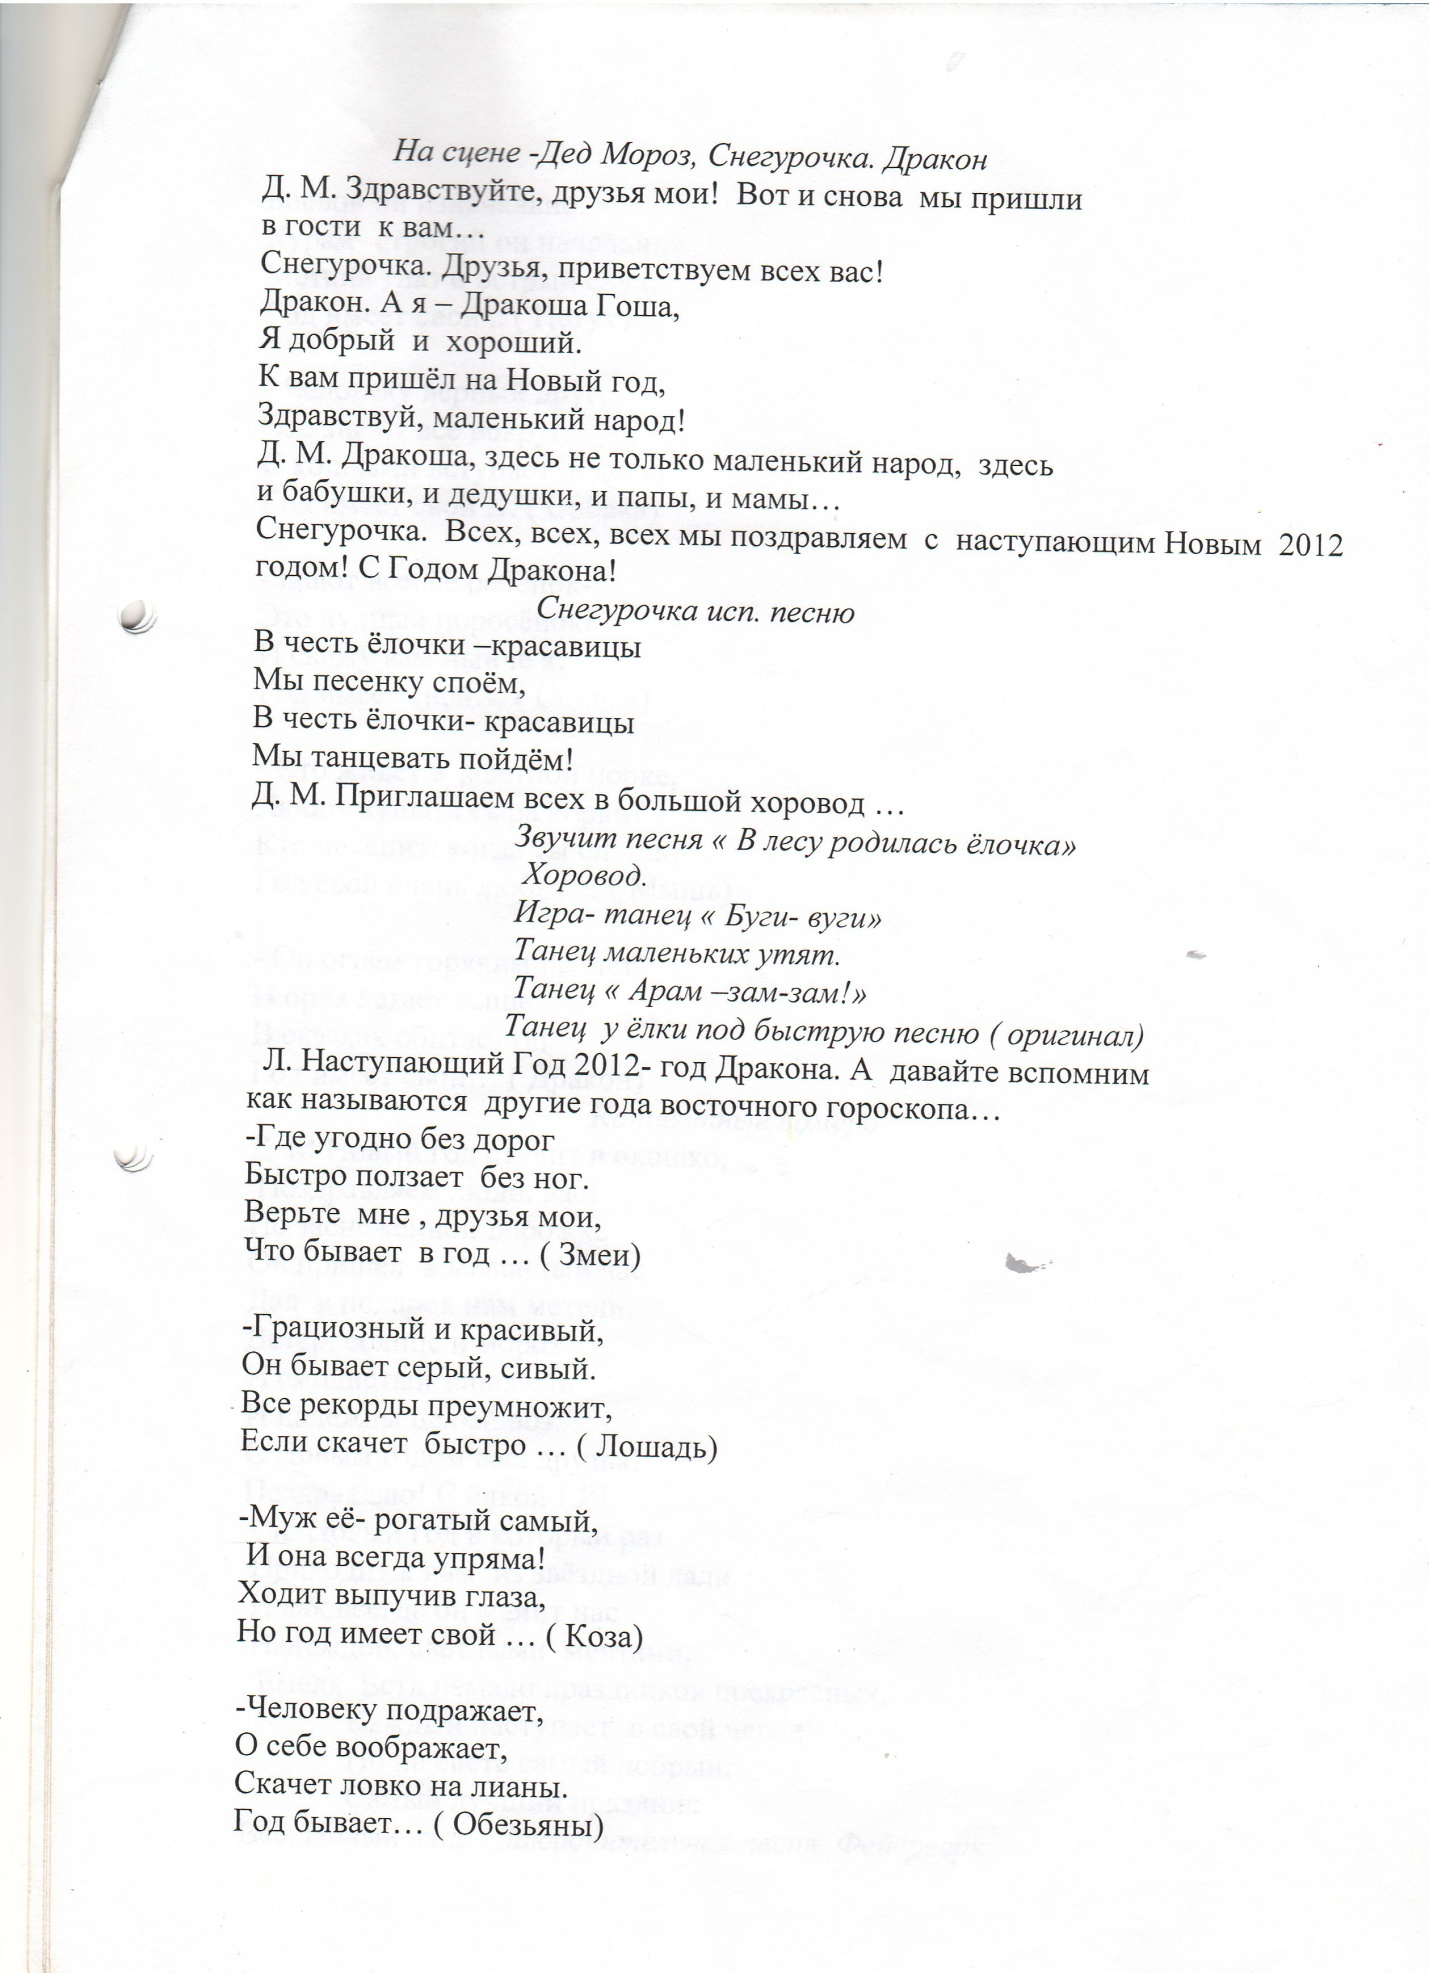 C:\Users\Sof\AppData\Roaming\Skype\My Skype Received Files\scan 5(2).jpg